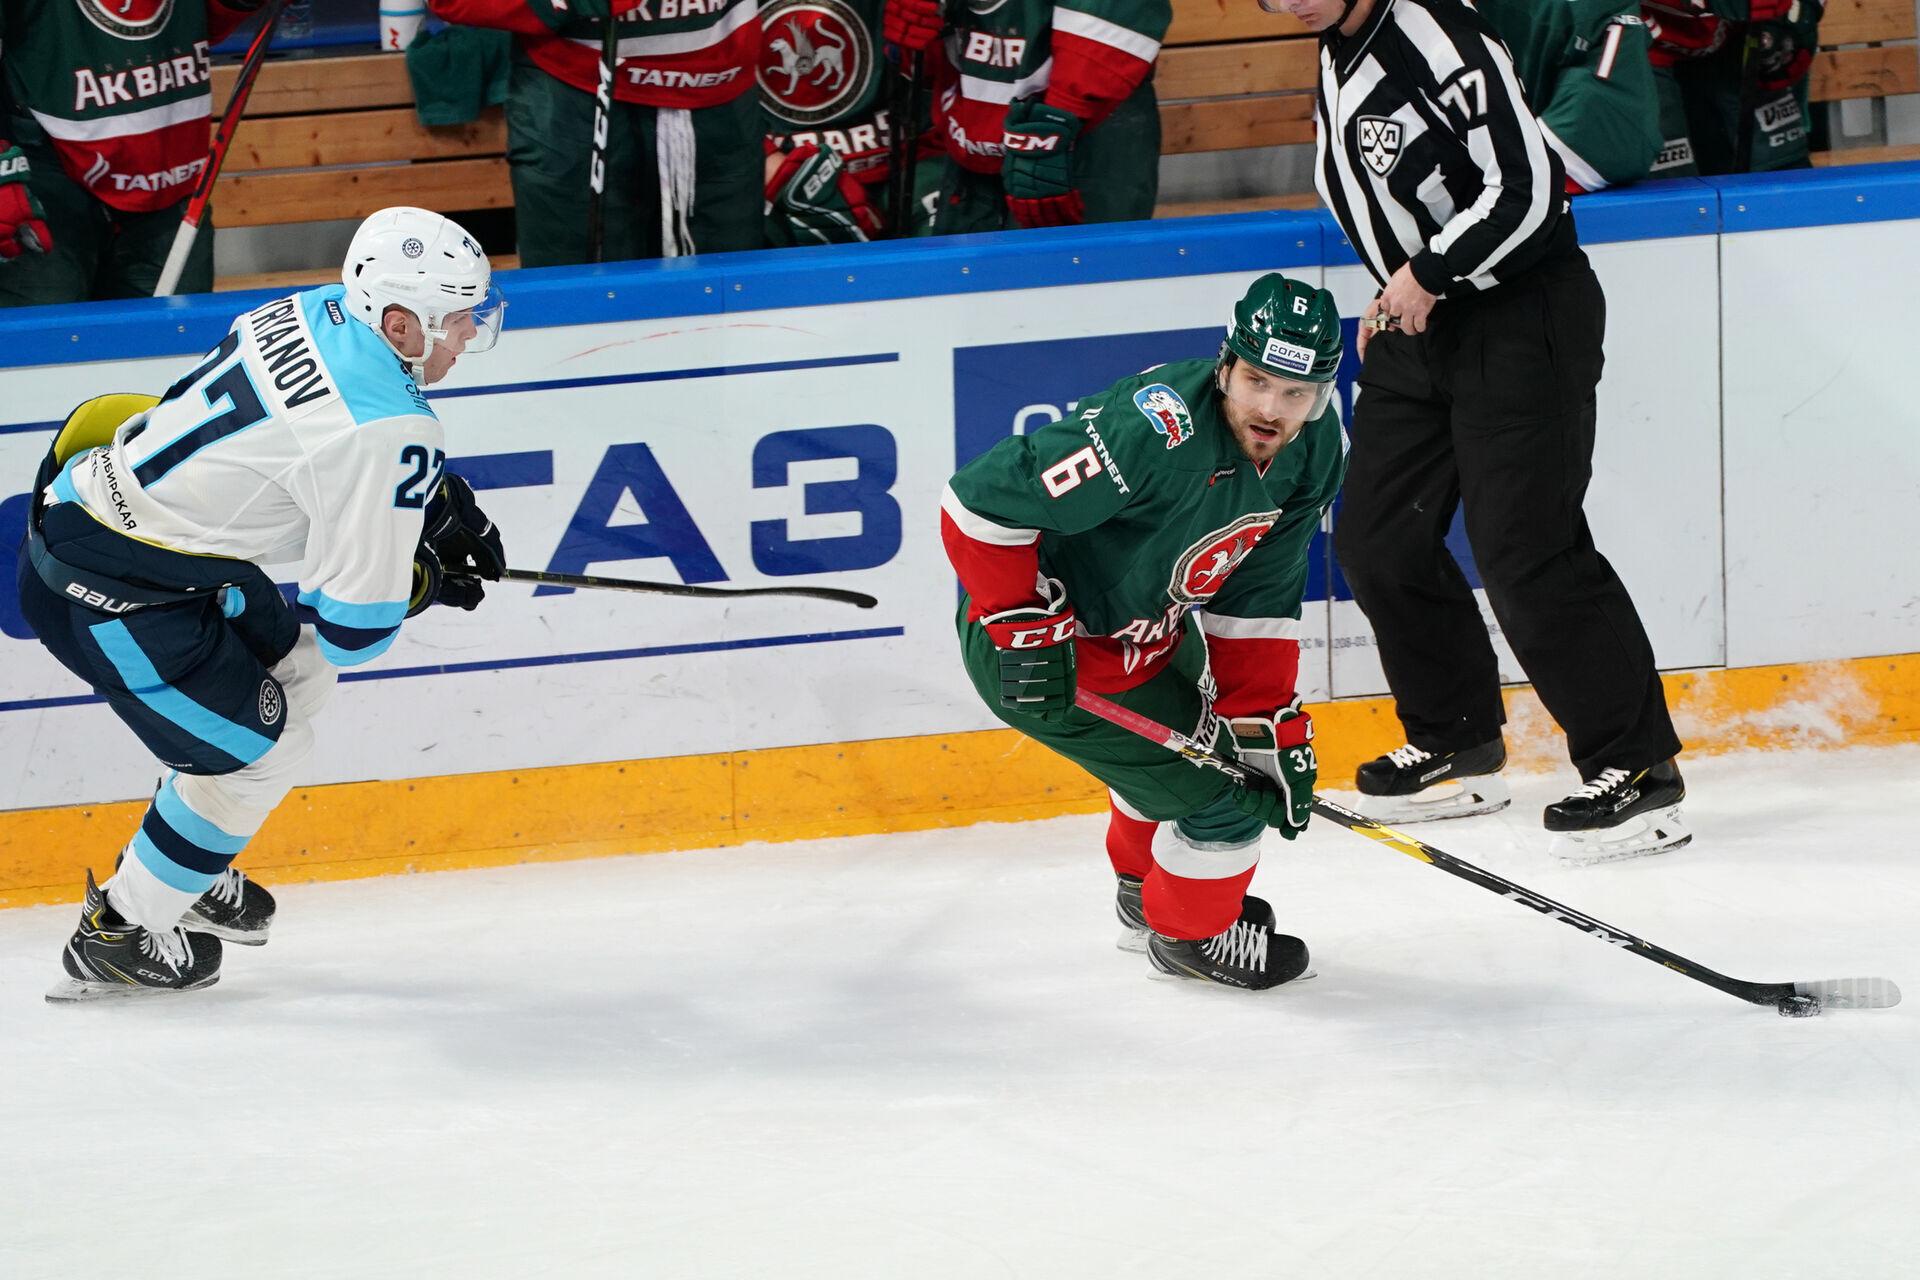 «Ак Барс» − «Сибирь». Всё об игре. 29.10.2020